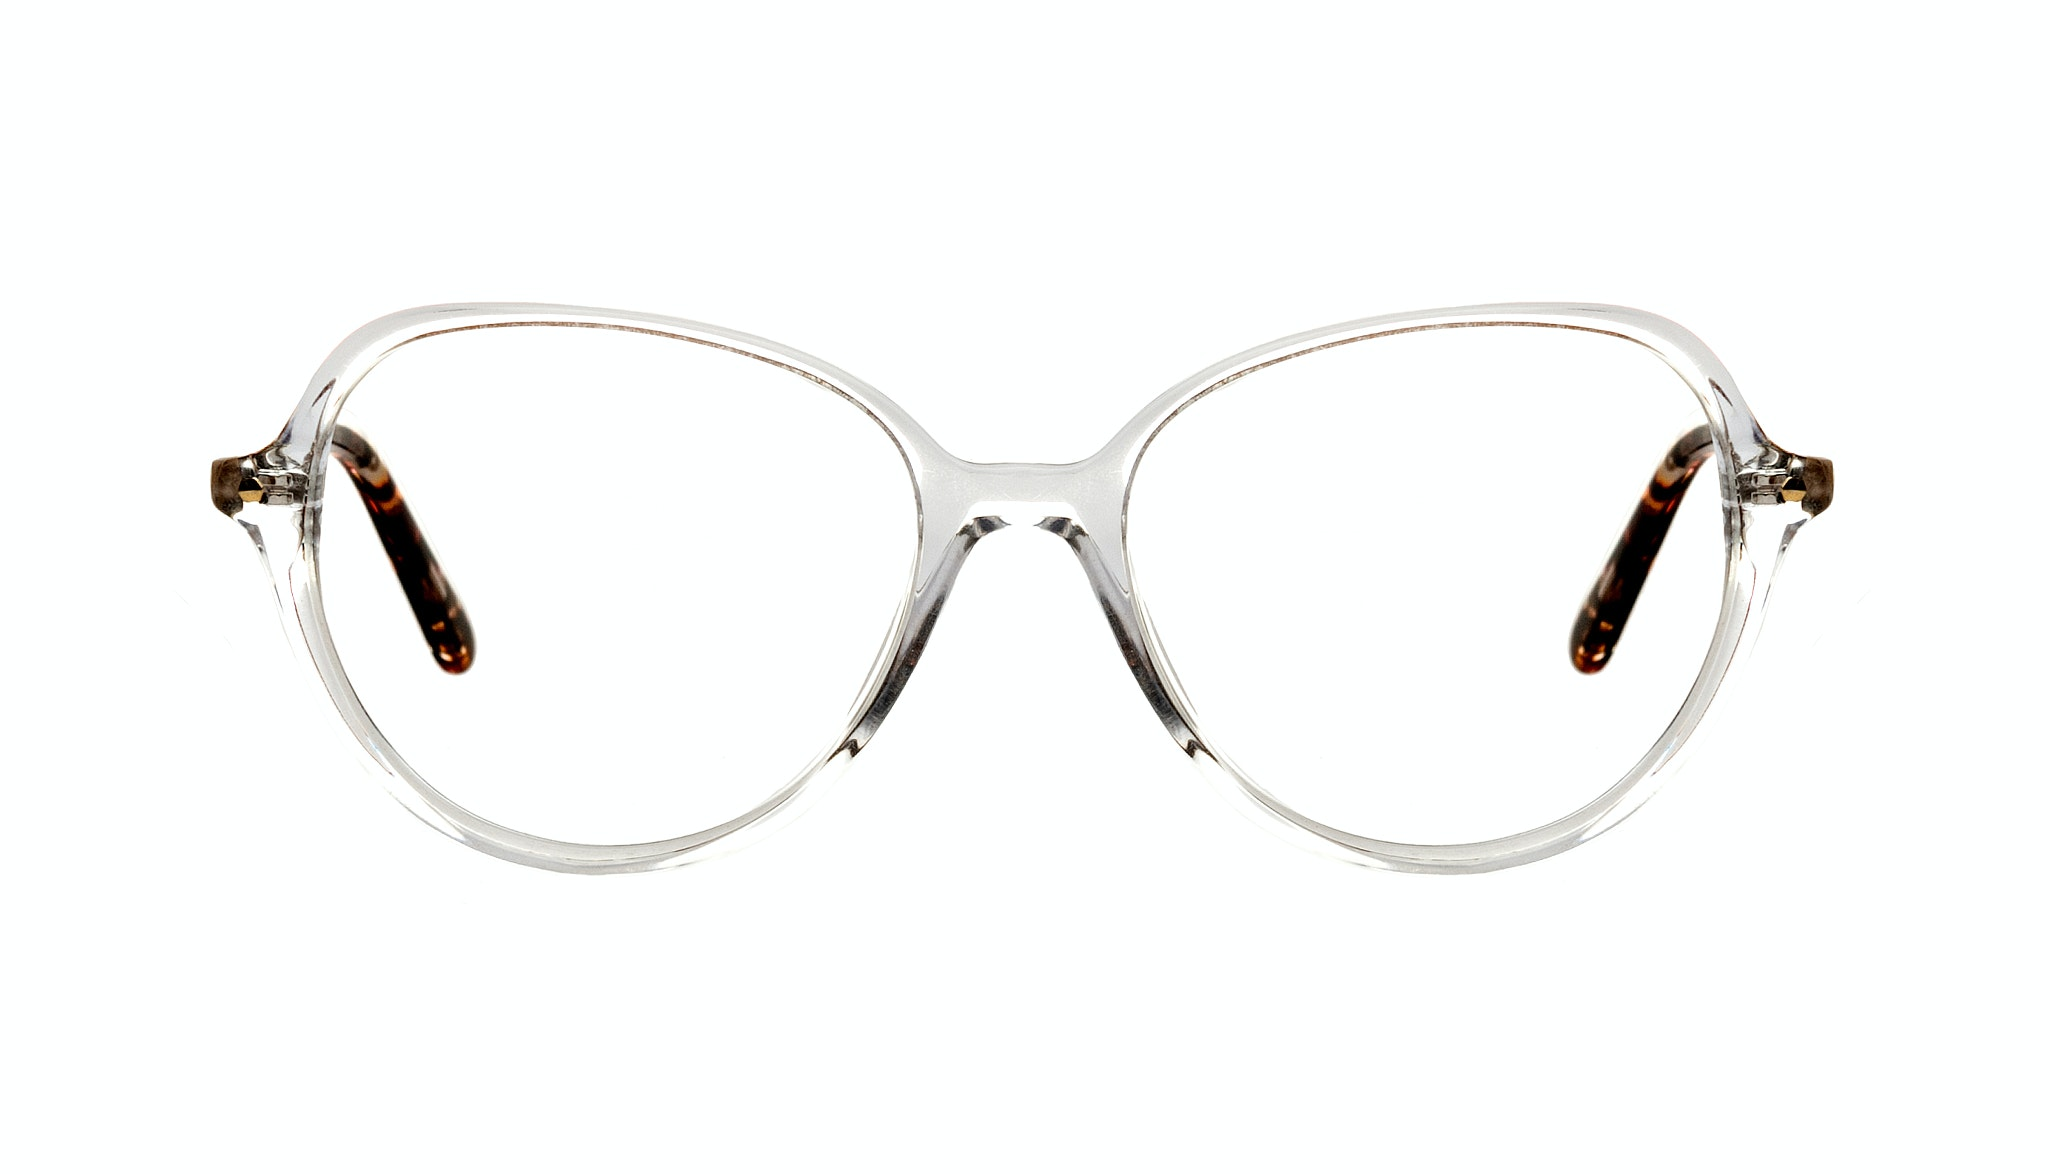 Affordable Fashion Glasses Round Eyeglasses Women Dazzle Diamond Lava